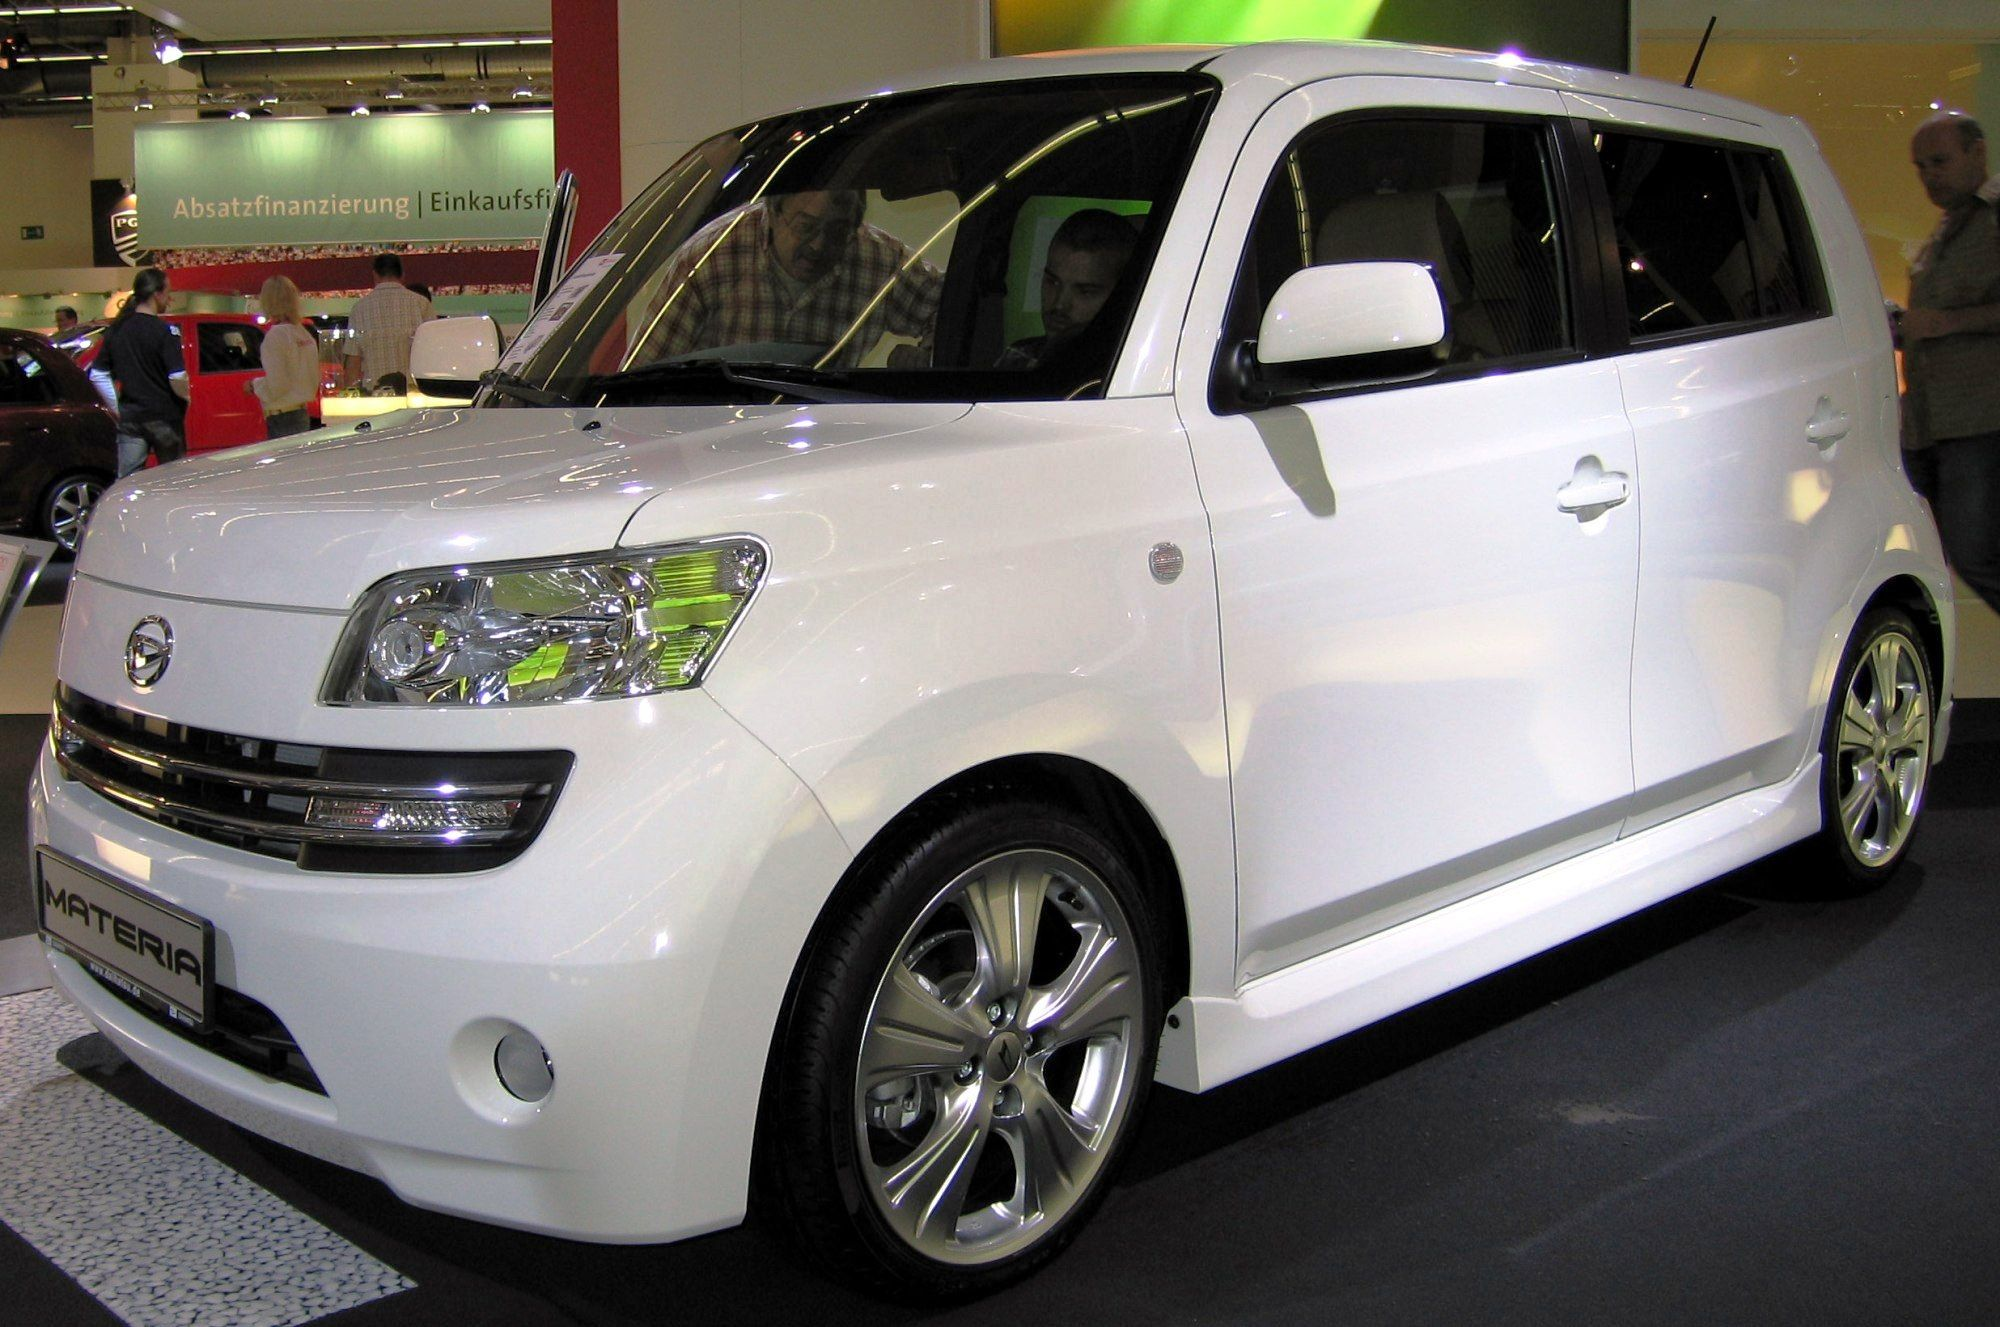 Daihatsu Materia Car Hd Wallpaper With Images Daihatsu Car Hd